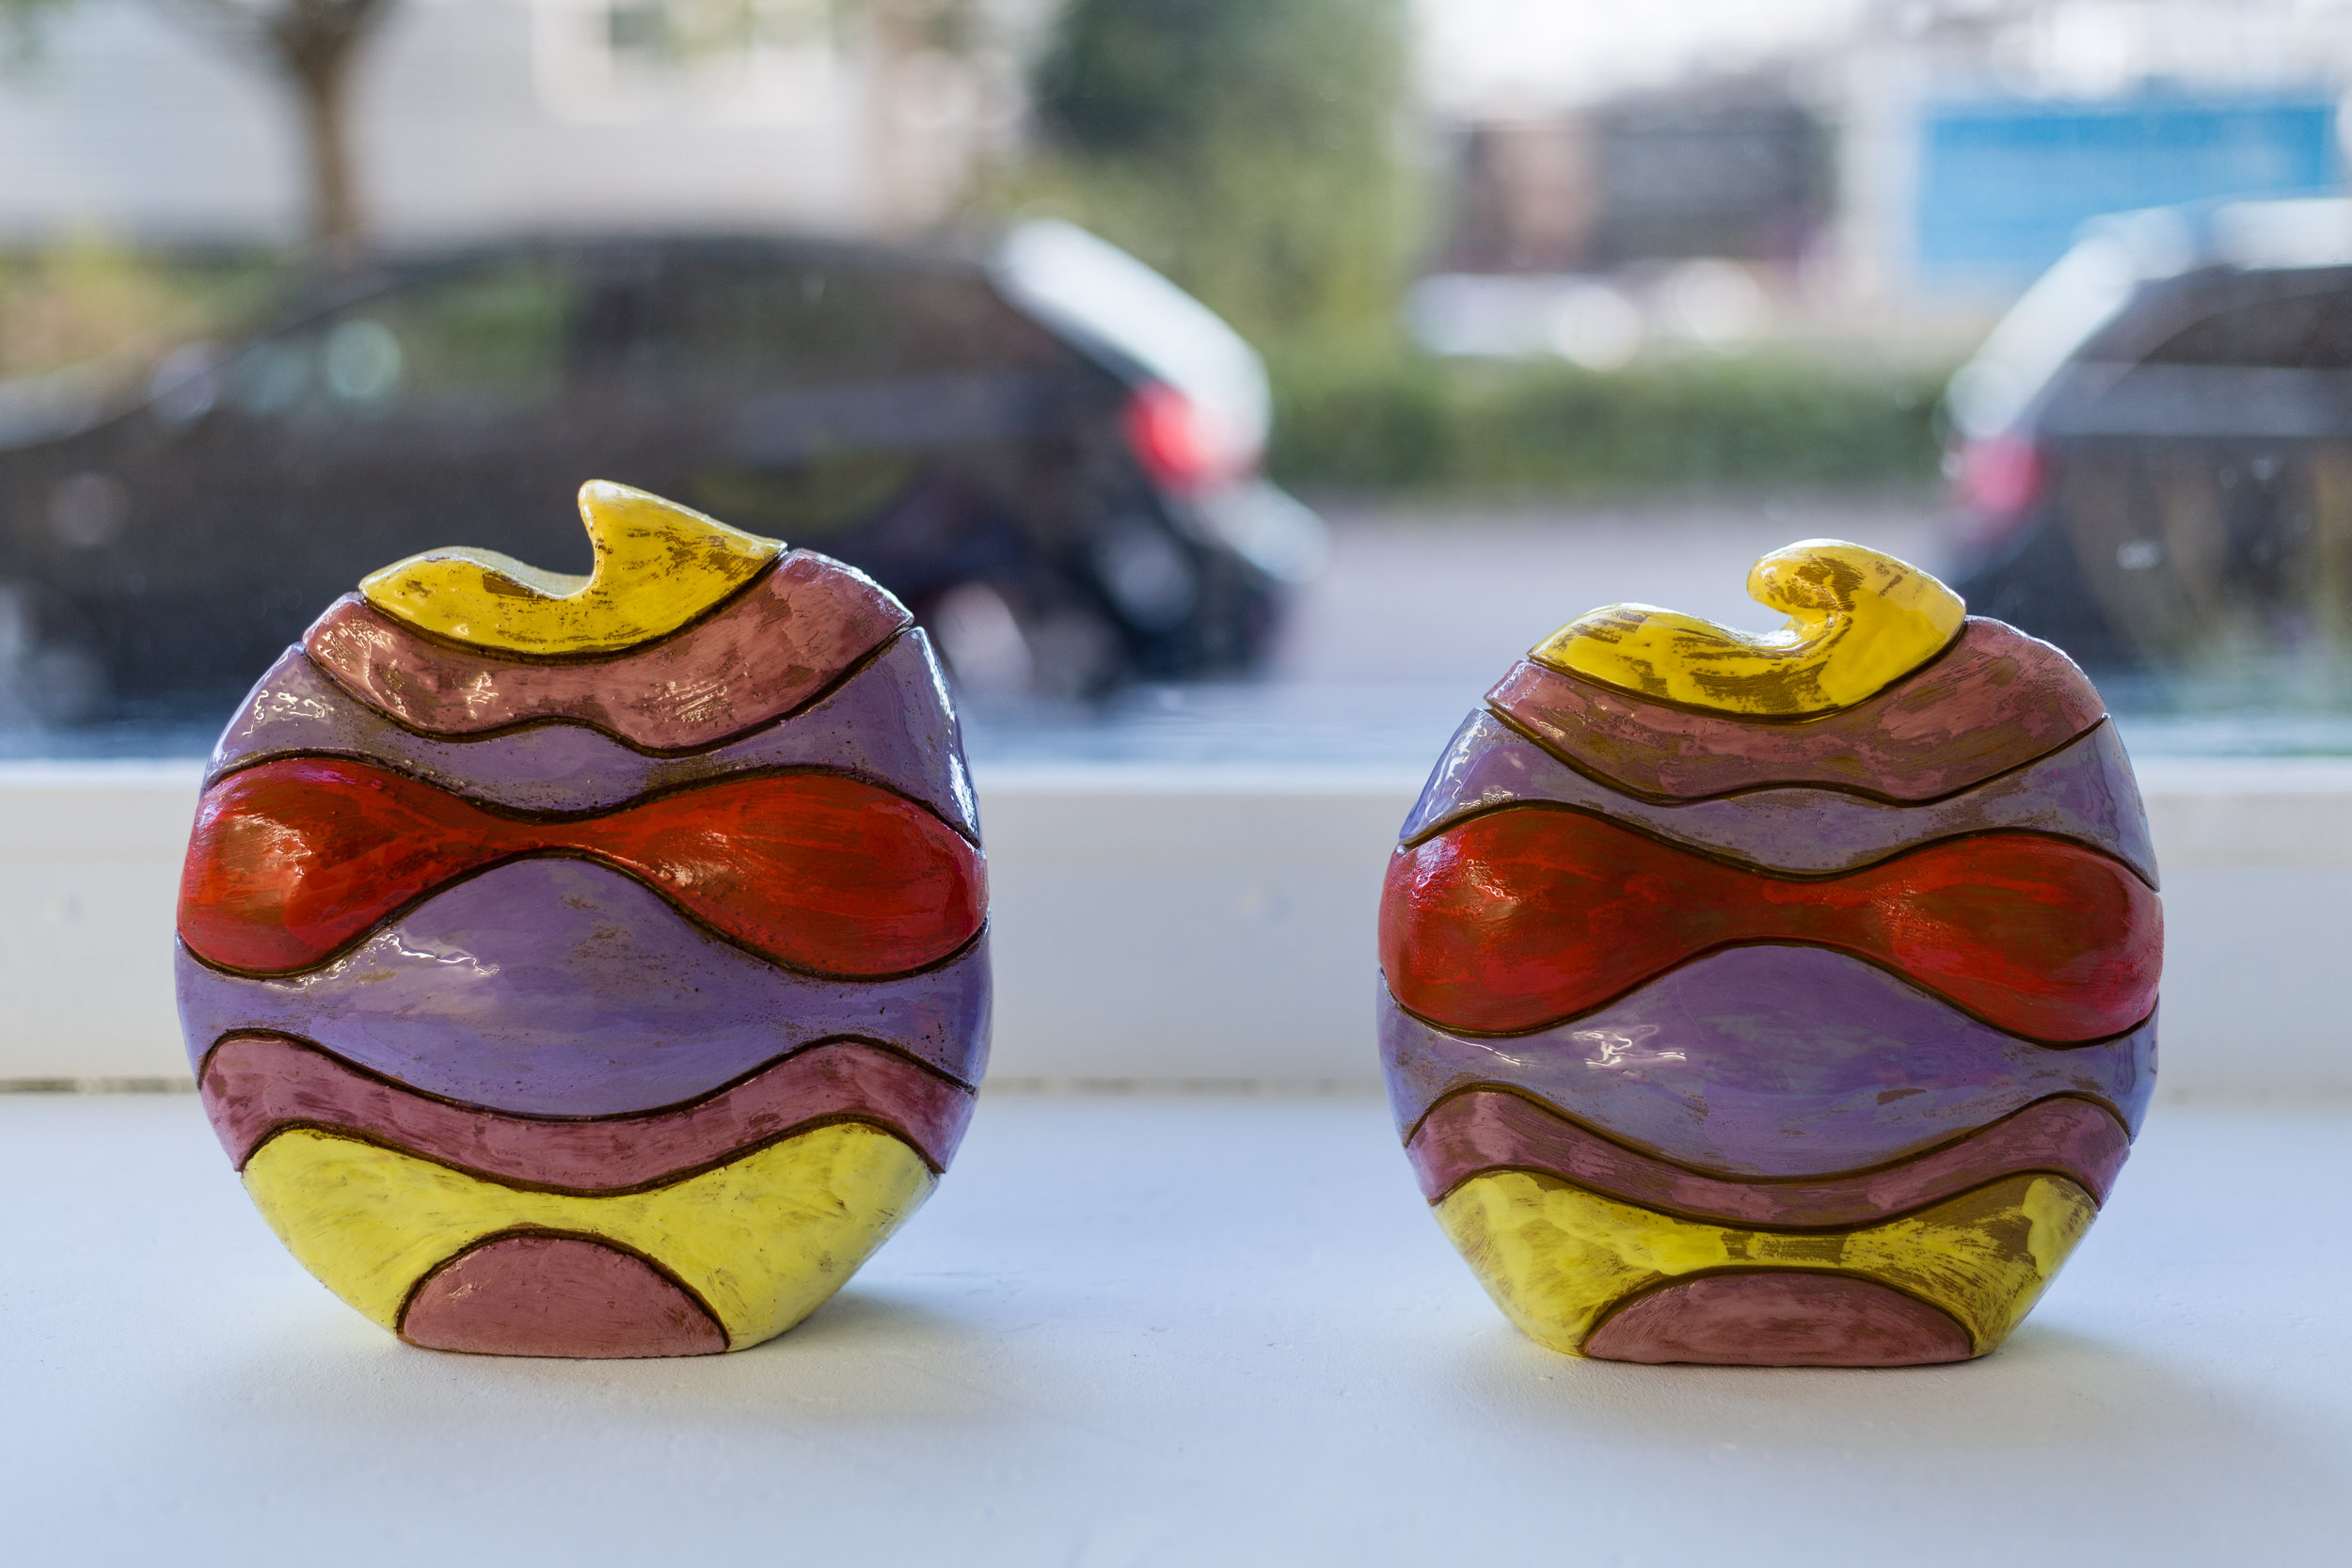 Donatella Bernardi,  Almost Ninja Turtles I-IV,  2017,clay with engobe and transparent glaze, 20 x 18 x 14 cm (each) Photo: Kilian Bannwart